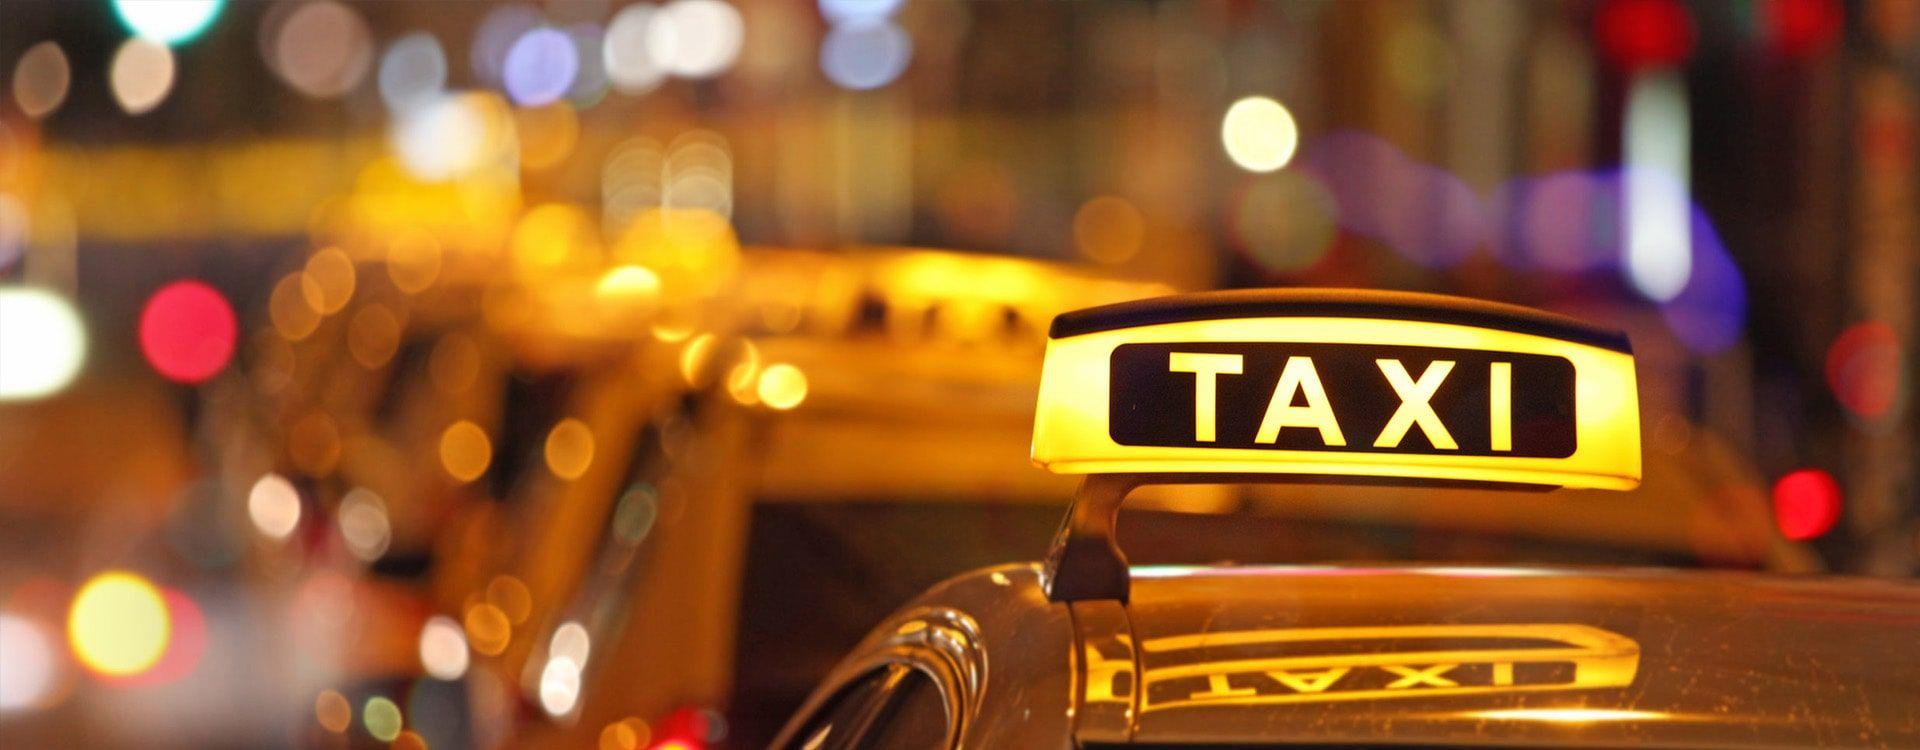 Sri Lanka Taxi Service Is A Leading Transport Company In Sri Lanka